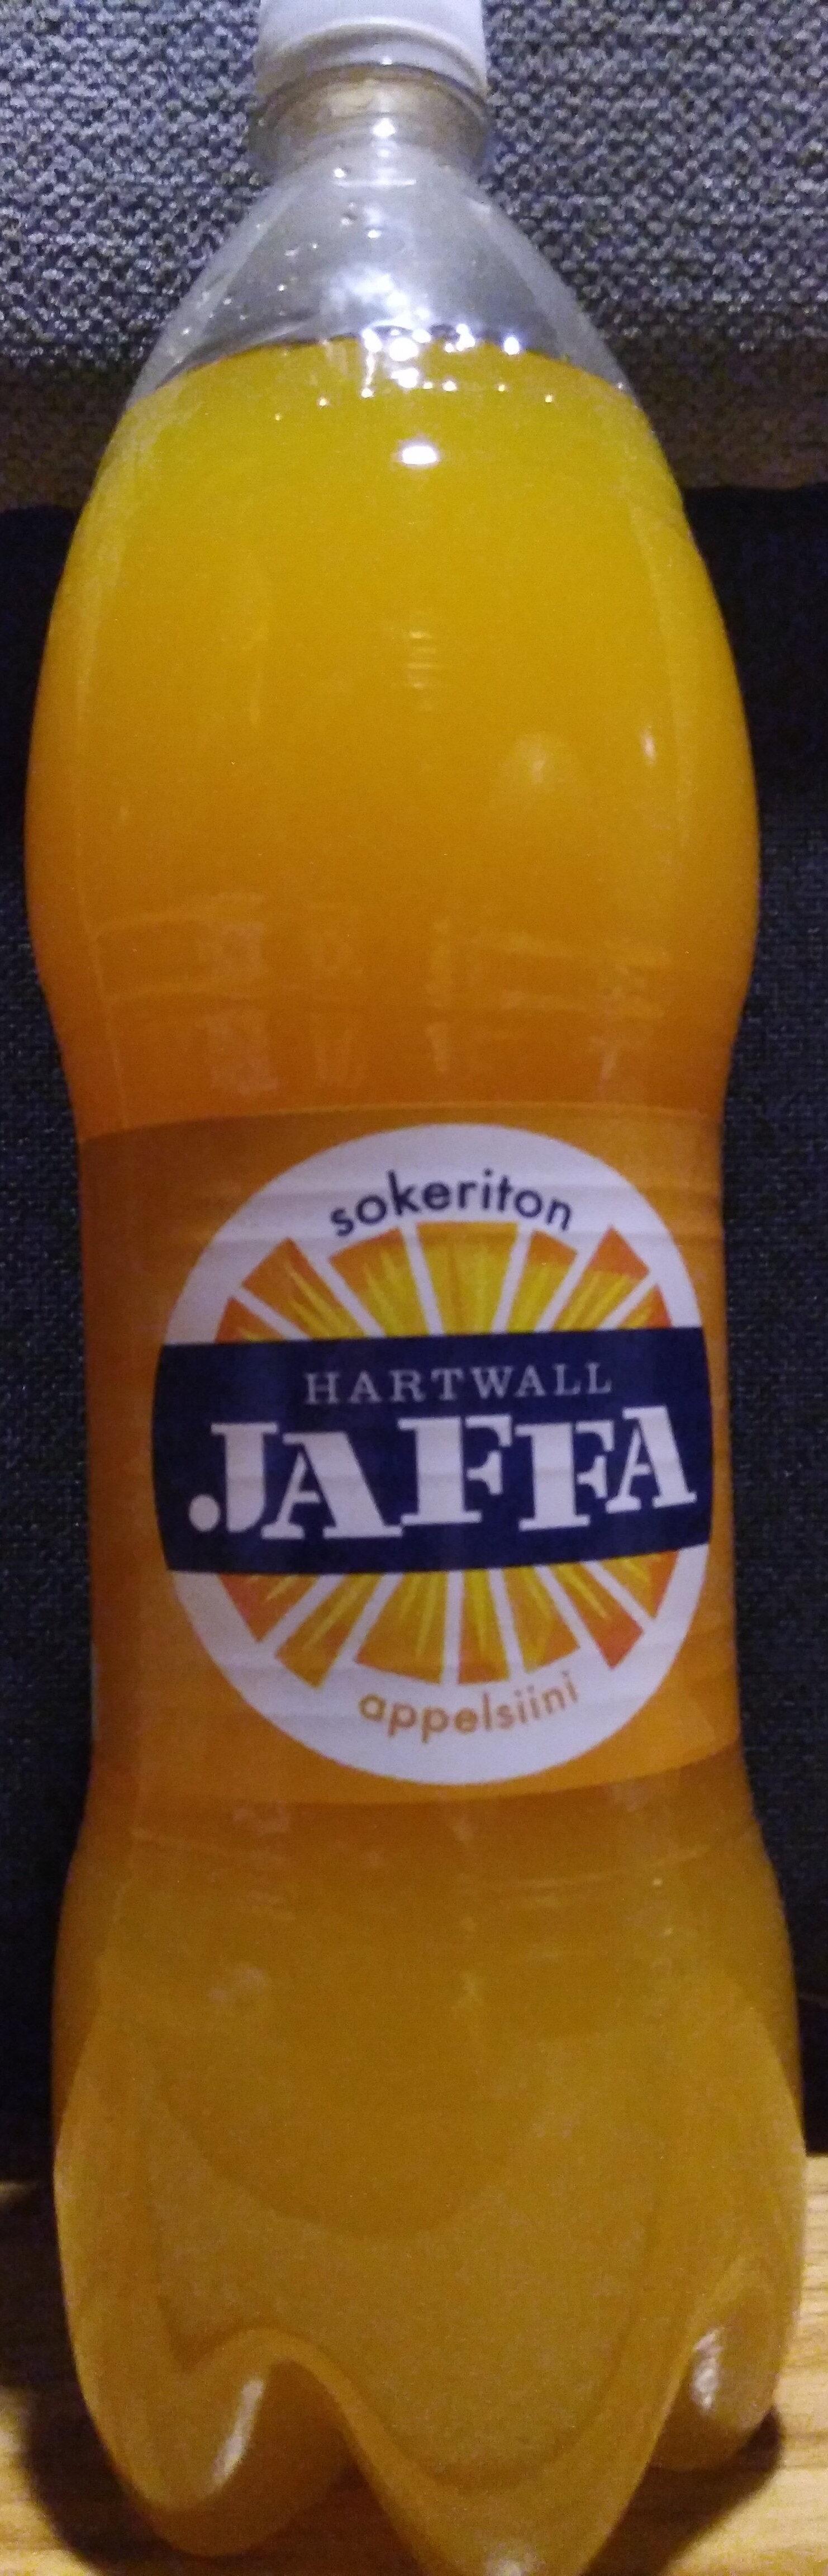 Sokeriton Jaffa - Product